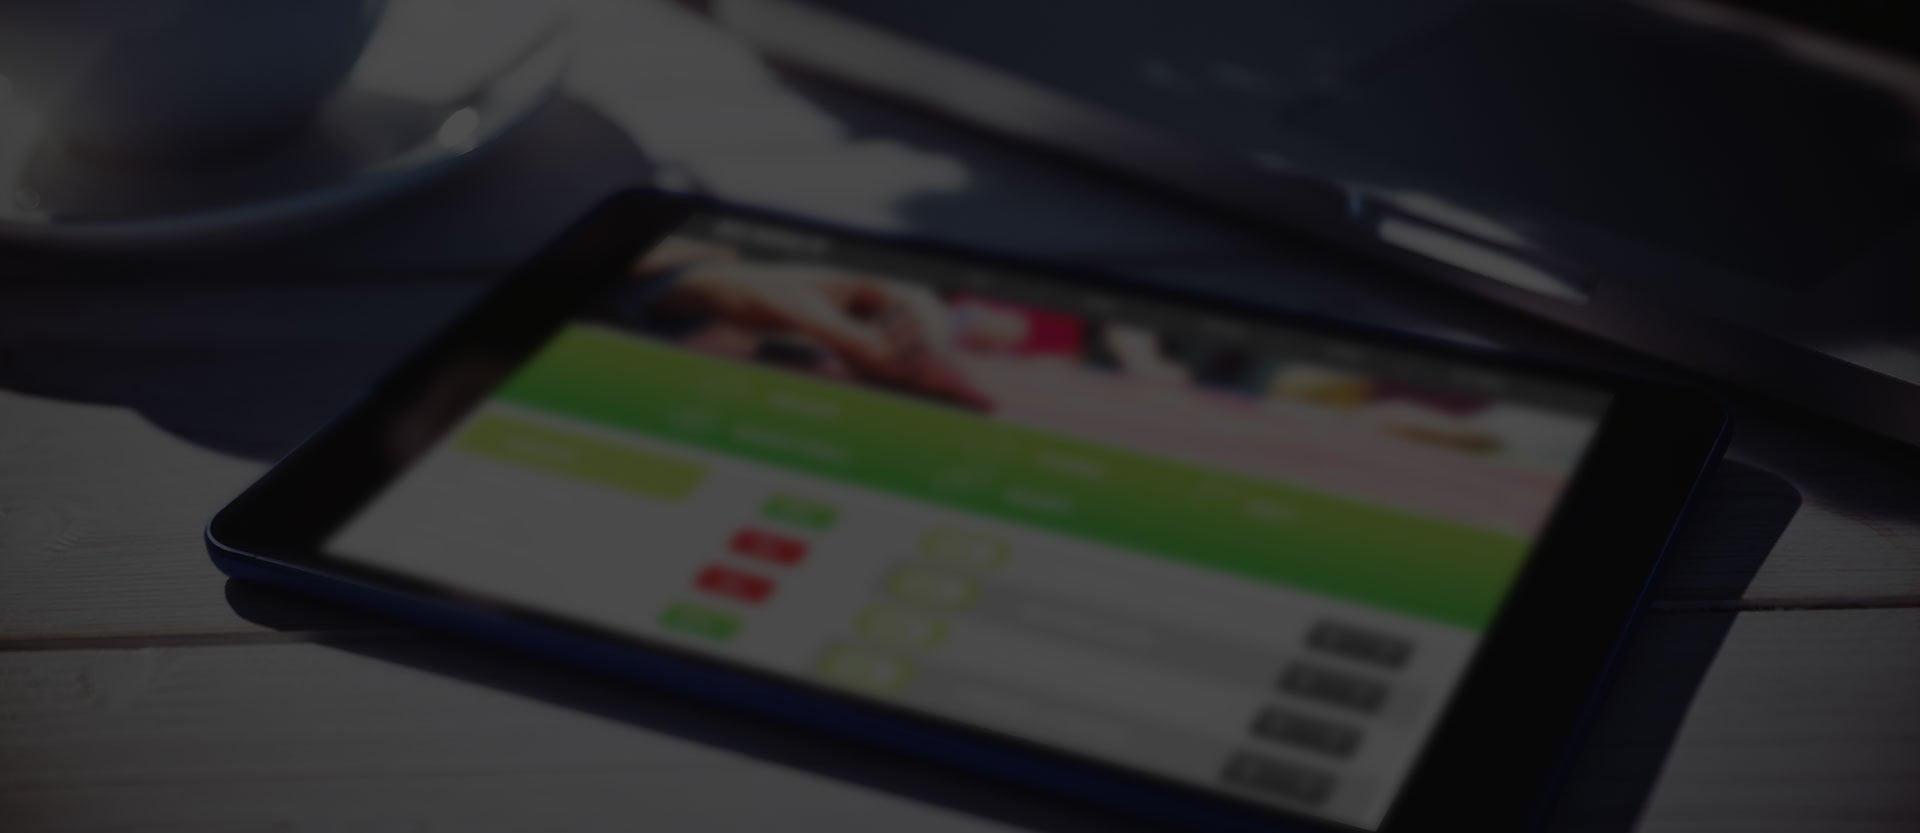 Preventing Fraud for Online Gaming